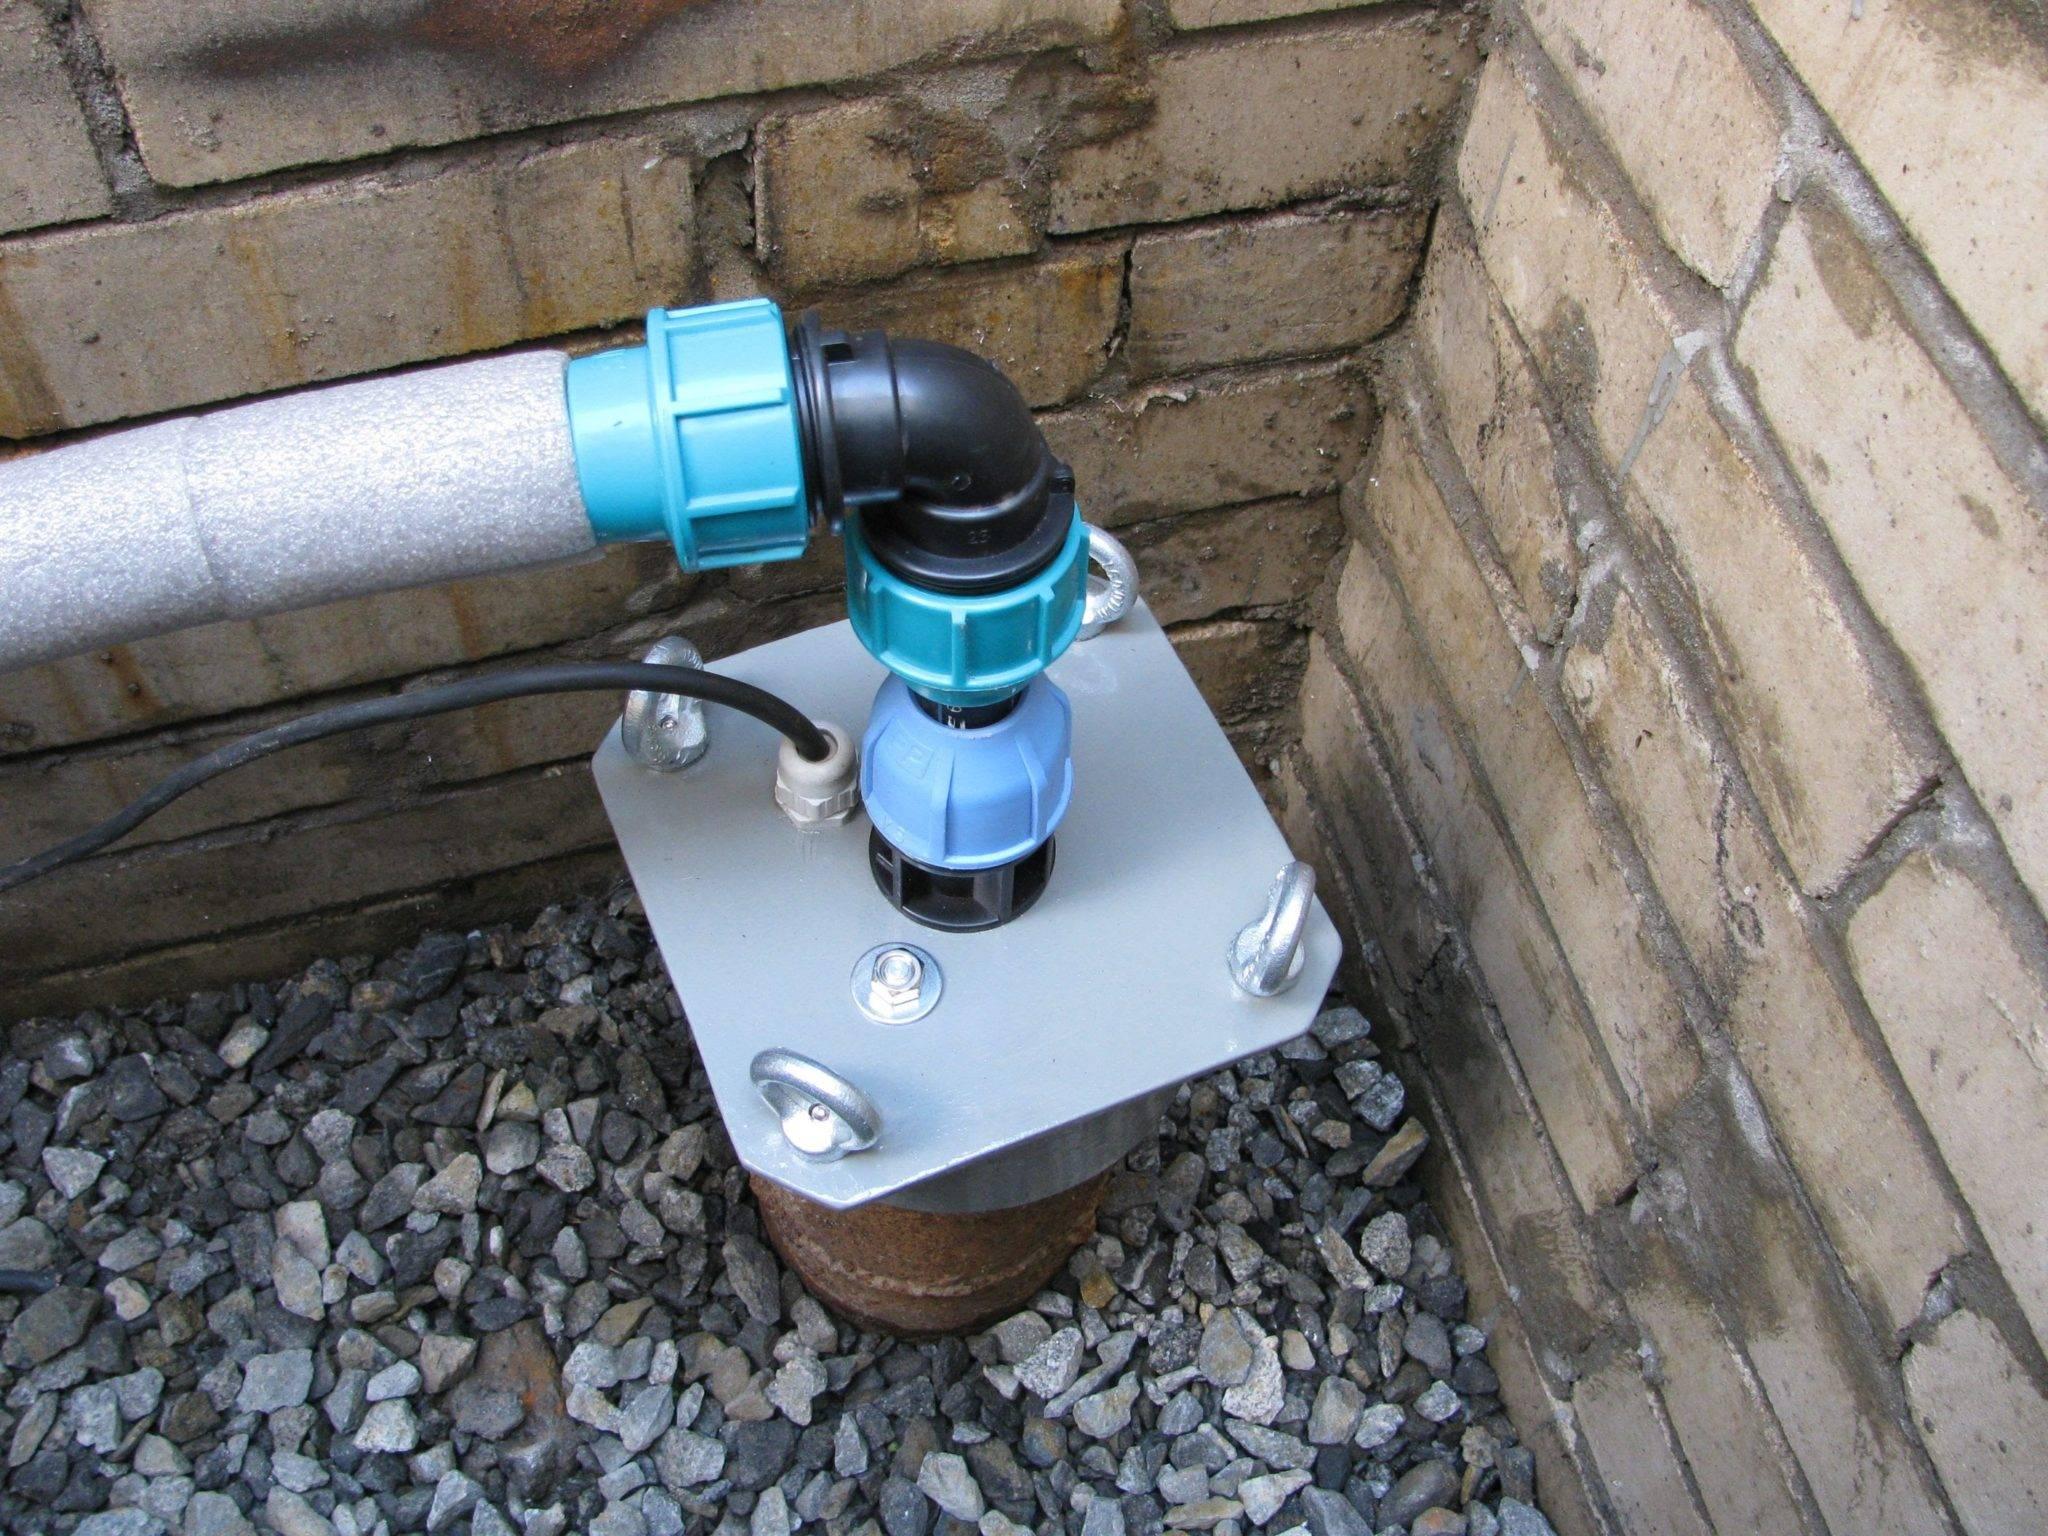 Схема водоснабжения частного дома с гидроаккумулятором, фото | гидро гуру